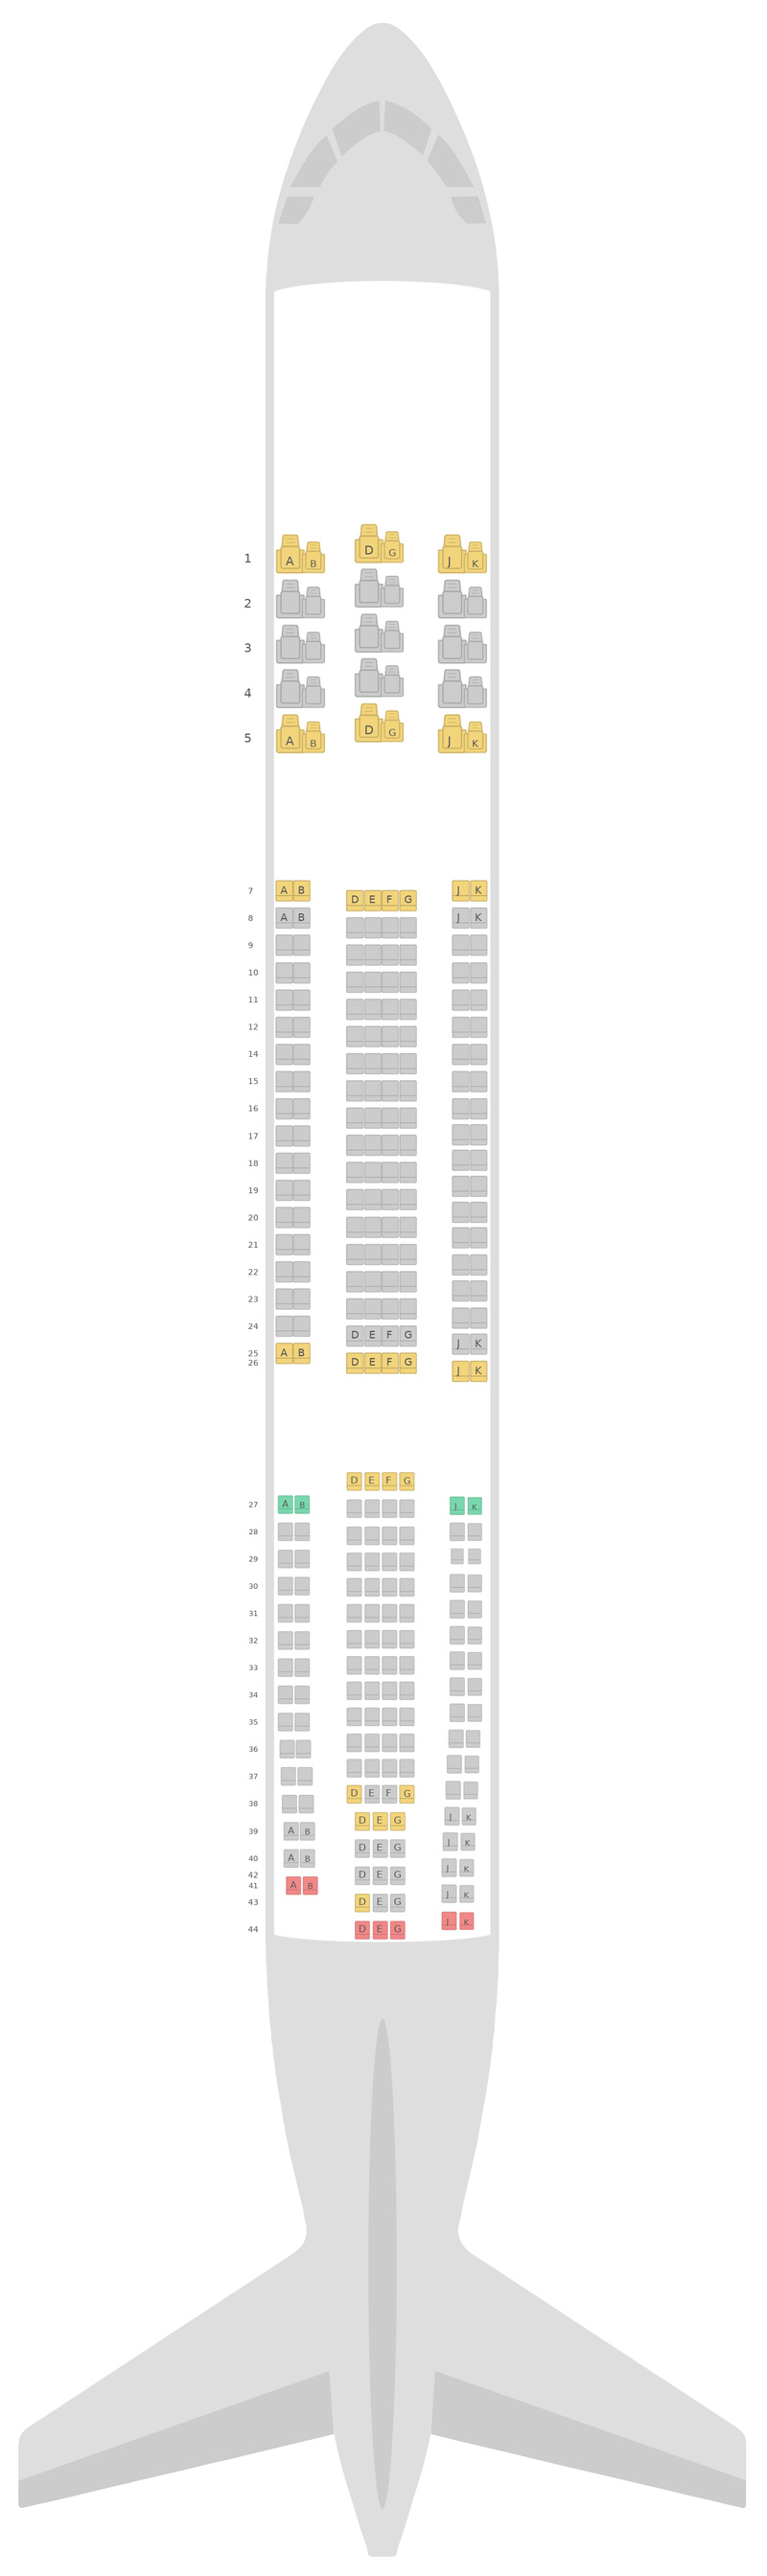 Mapa de asientos Airbus A330-300 (333) v1 China Airlines